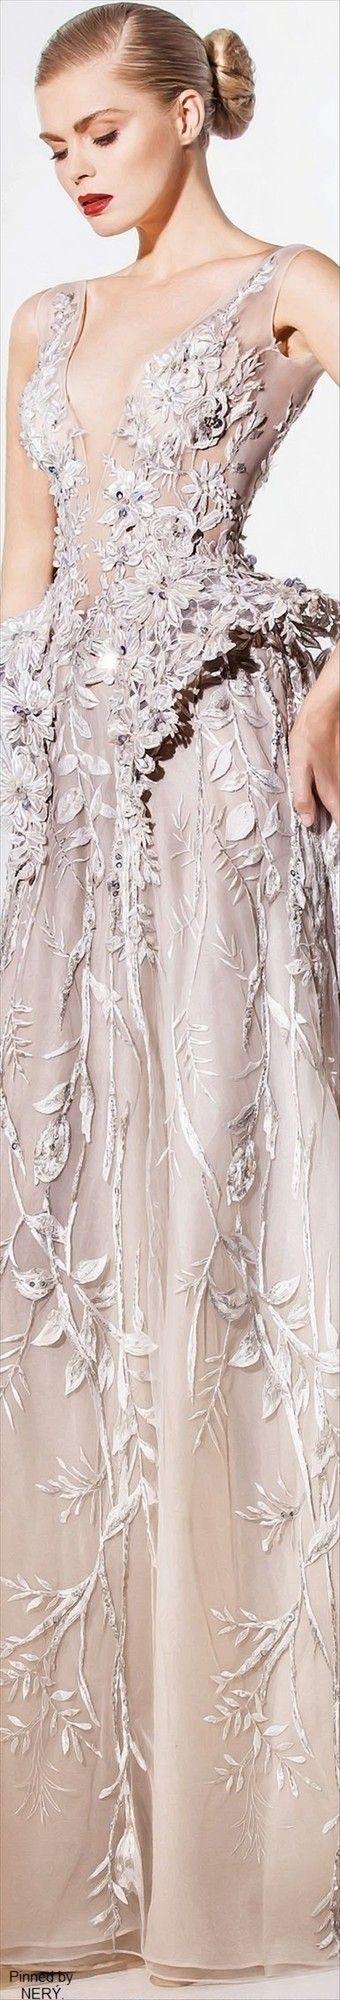 Blankla Matragi Bridal ''Elemets:Love'' 2017 Collection